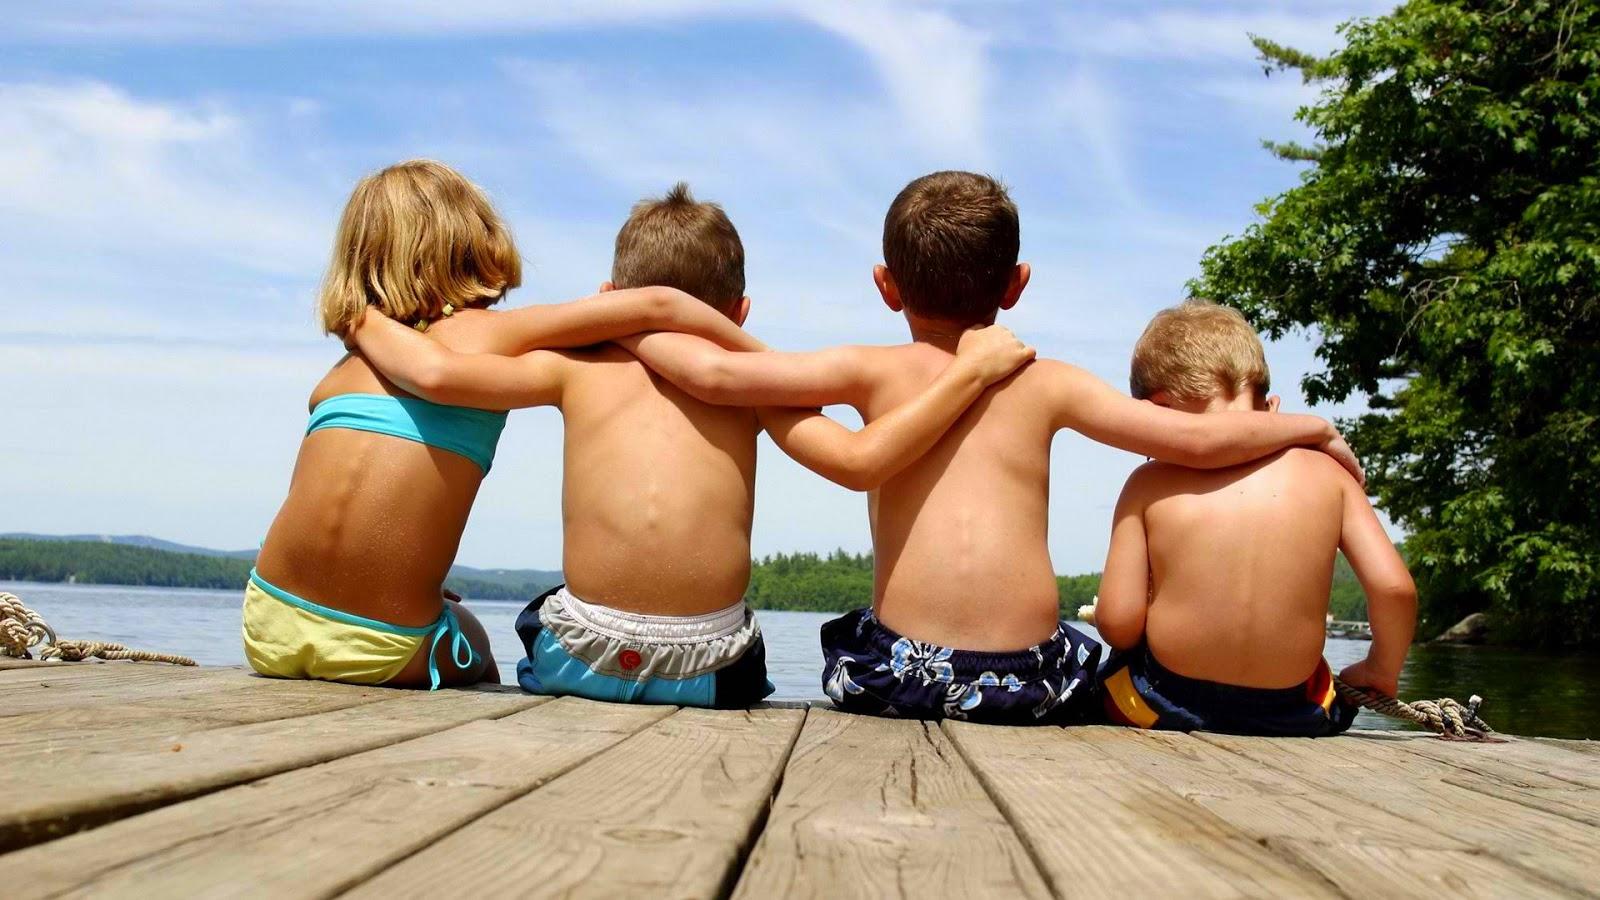 Фото про друзей детей